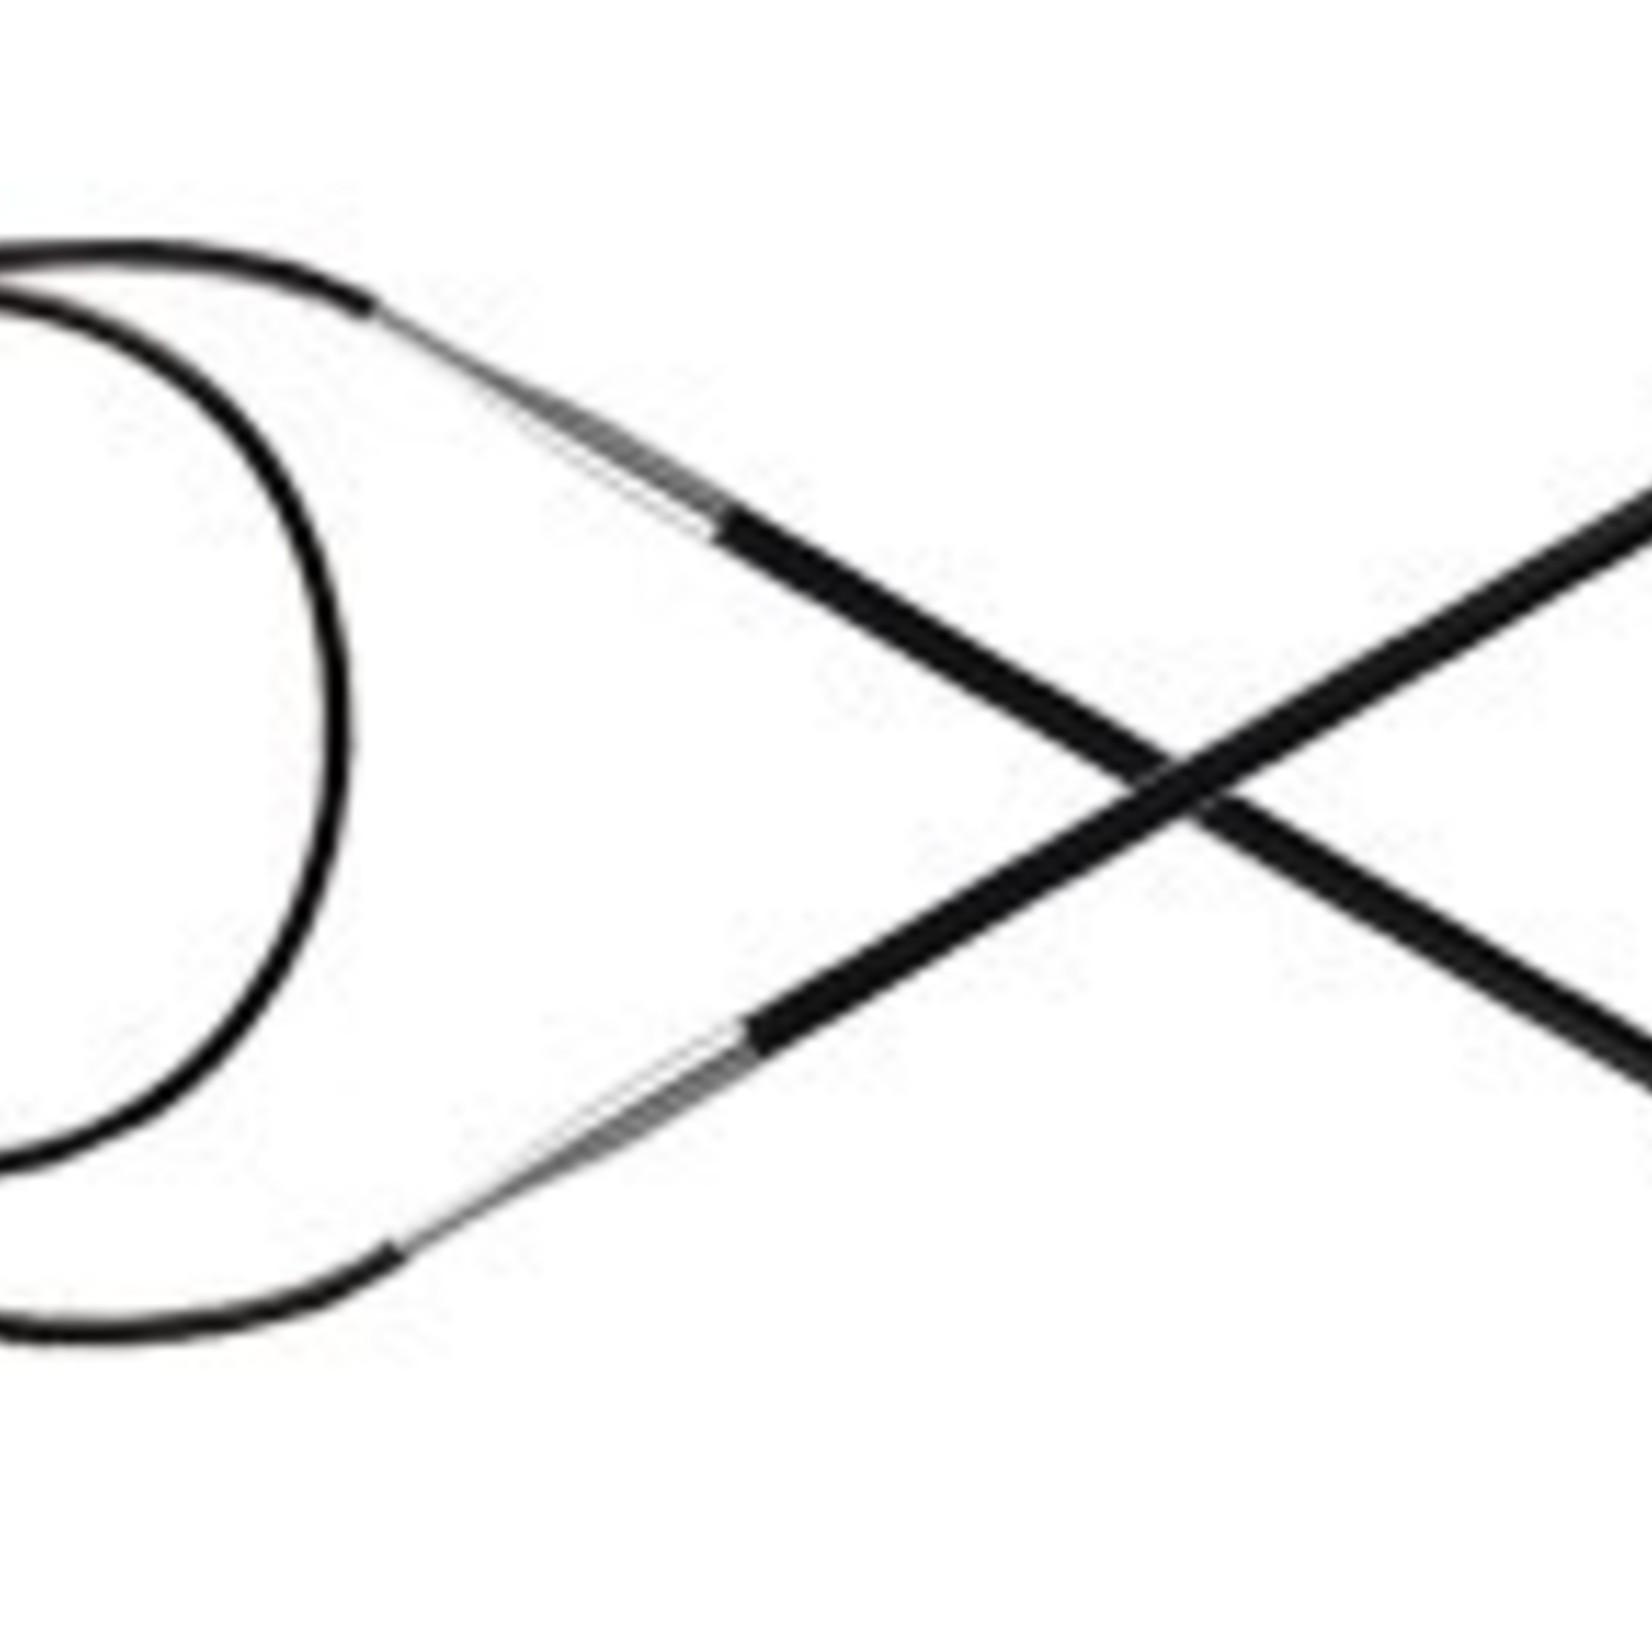 Knitter's Pride 9 Karbonz Circular 16